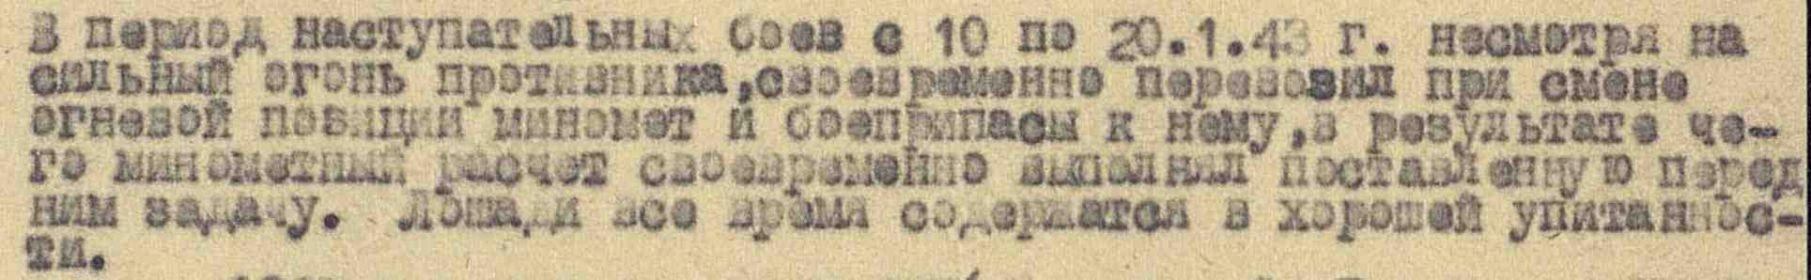 Приказ №7 н. 1315 ст.полку 173 Ст.дивизии донской фронт. 22.01.1943г.